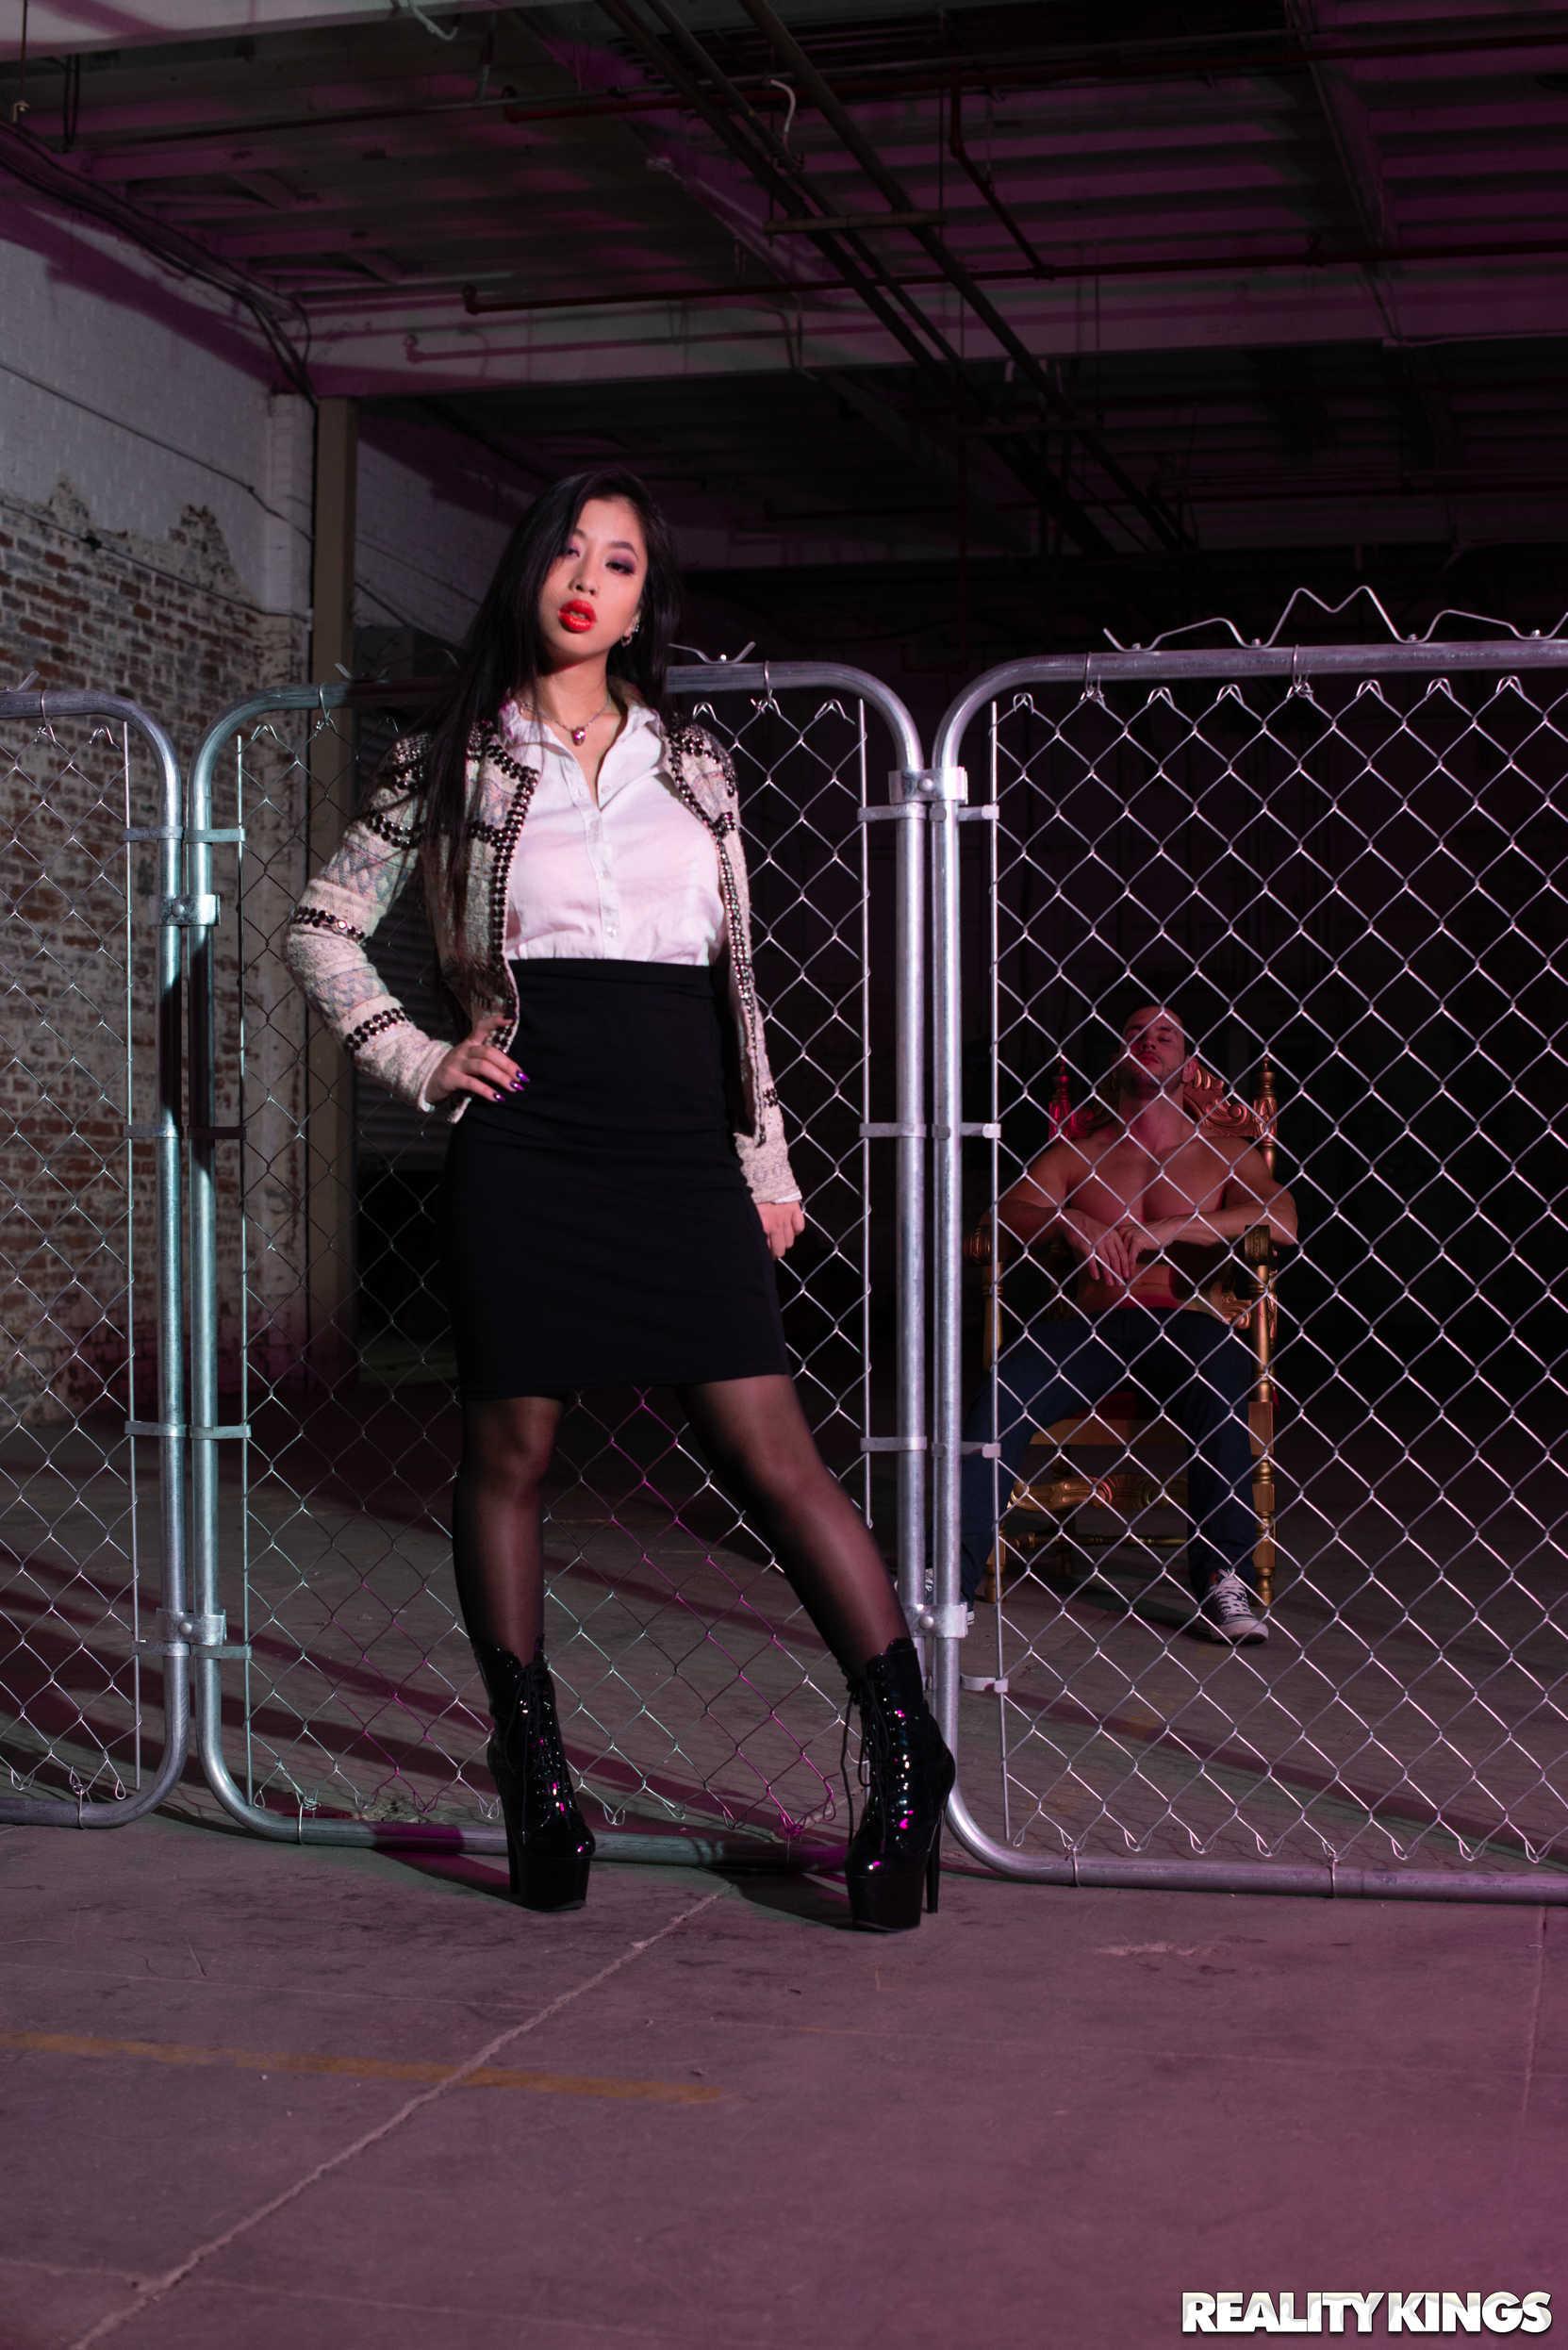 Reality Kings 'Chainlink Tease' starring Jade Kush (Photo 6)